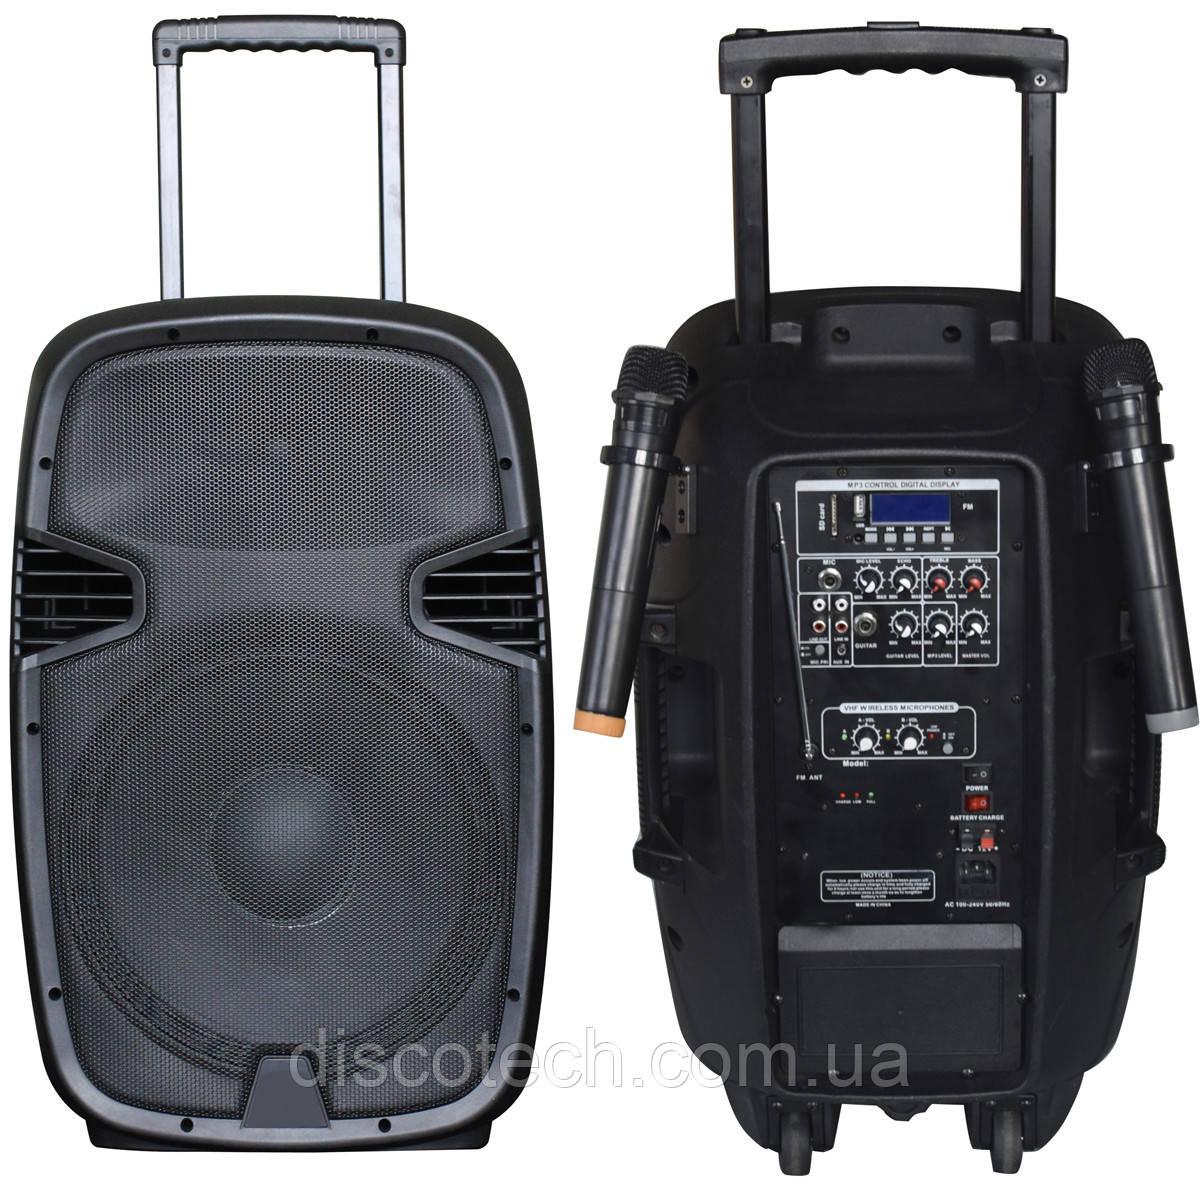 JB12RECHARGE350+MP3/Bluetooth+20V INVERTER+2pcs VHF mic